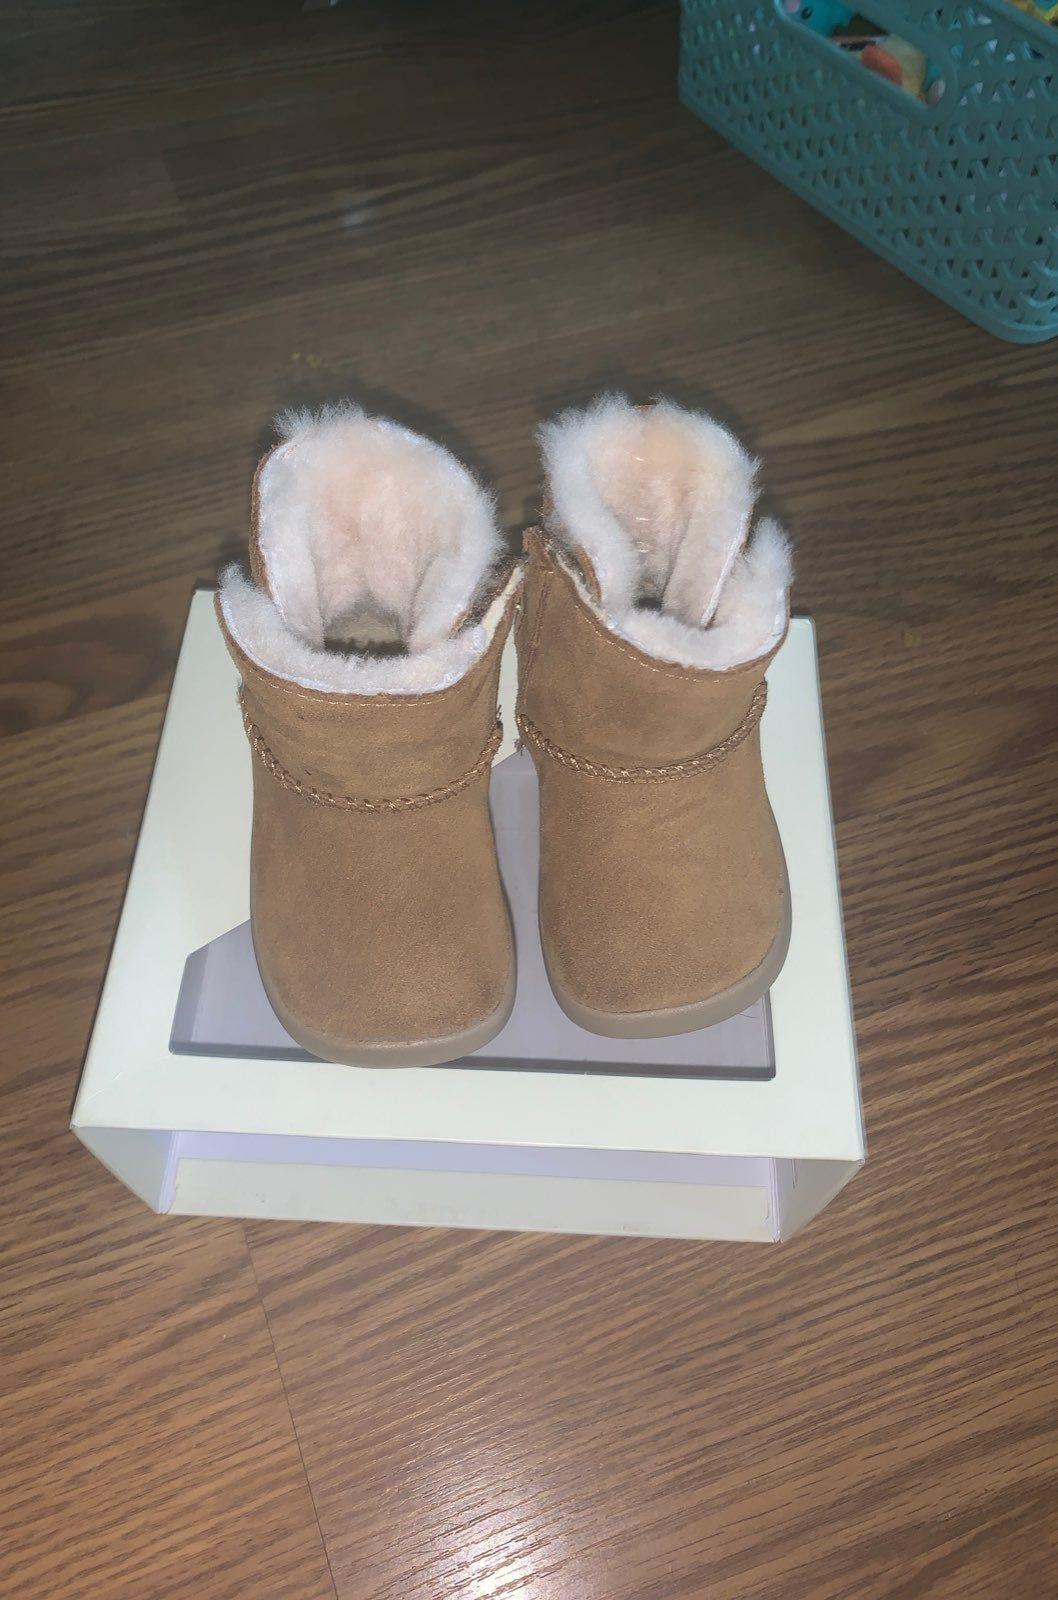 Ugg boots, Baby ugg boots